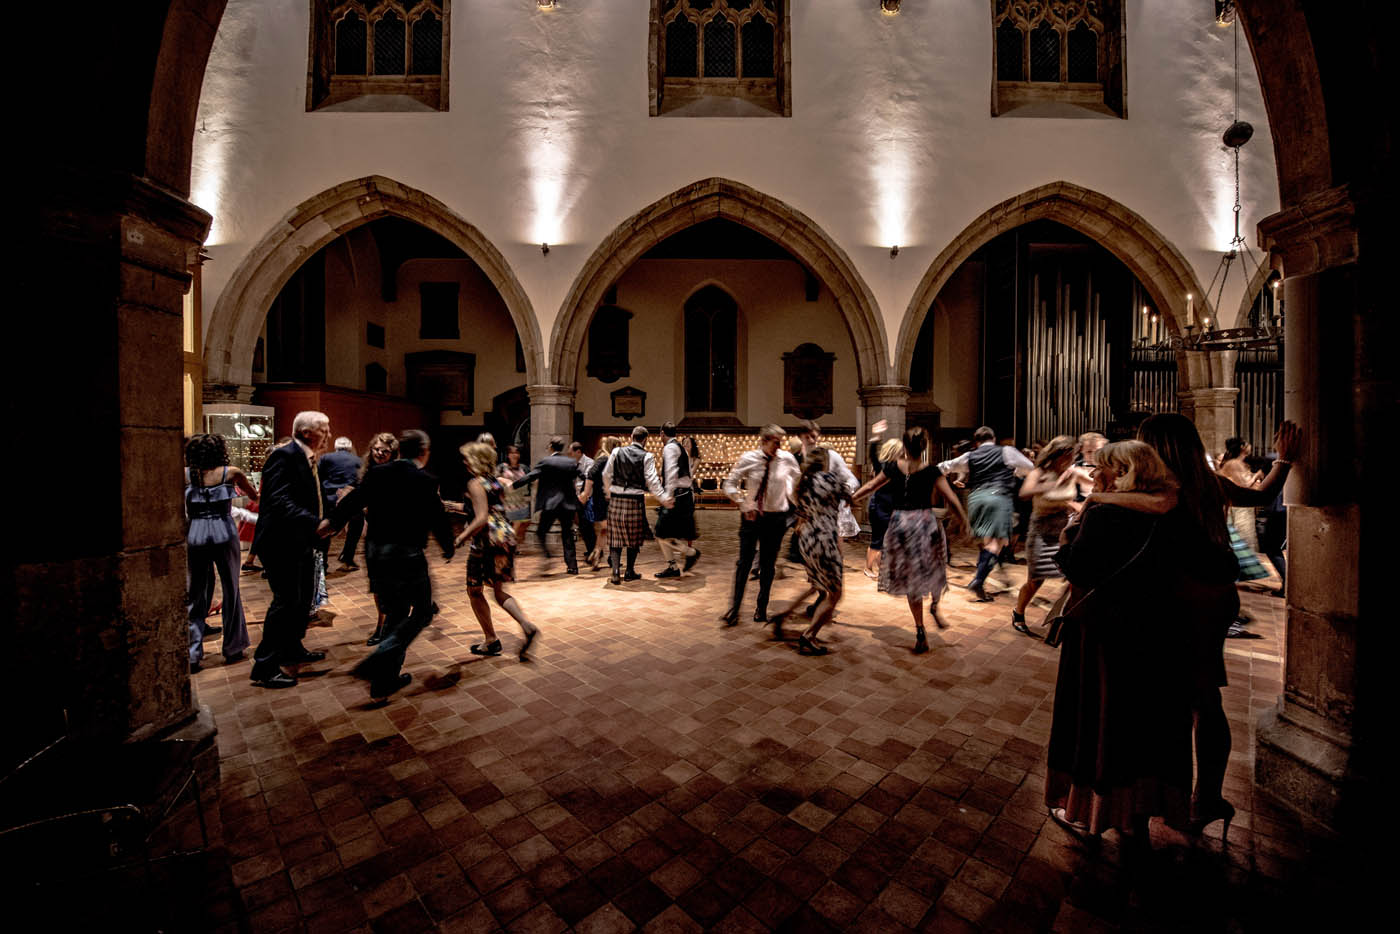 ALL-SAINTS-CHURCH-KINGSTON-WEDDING-DANCING.jpg